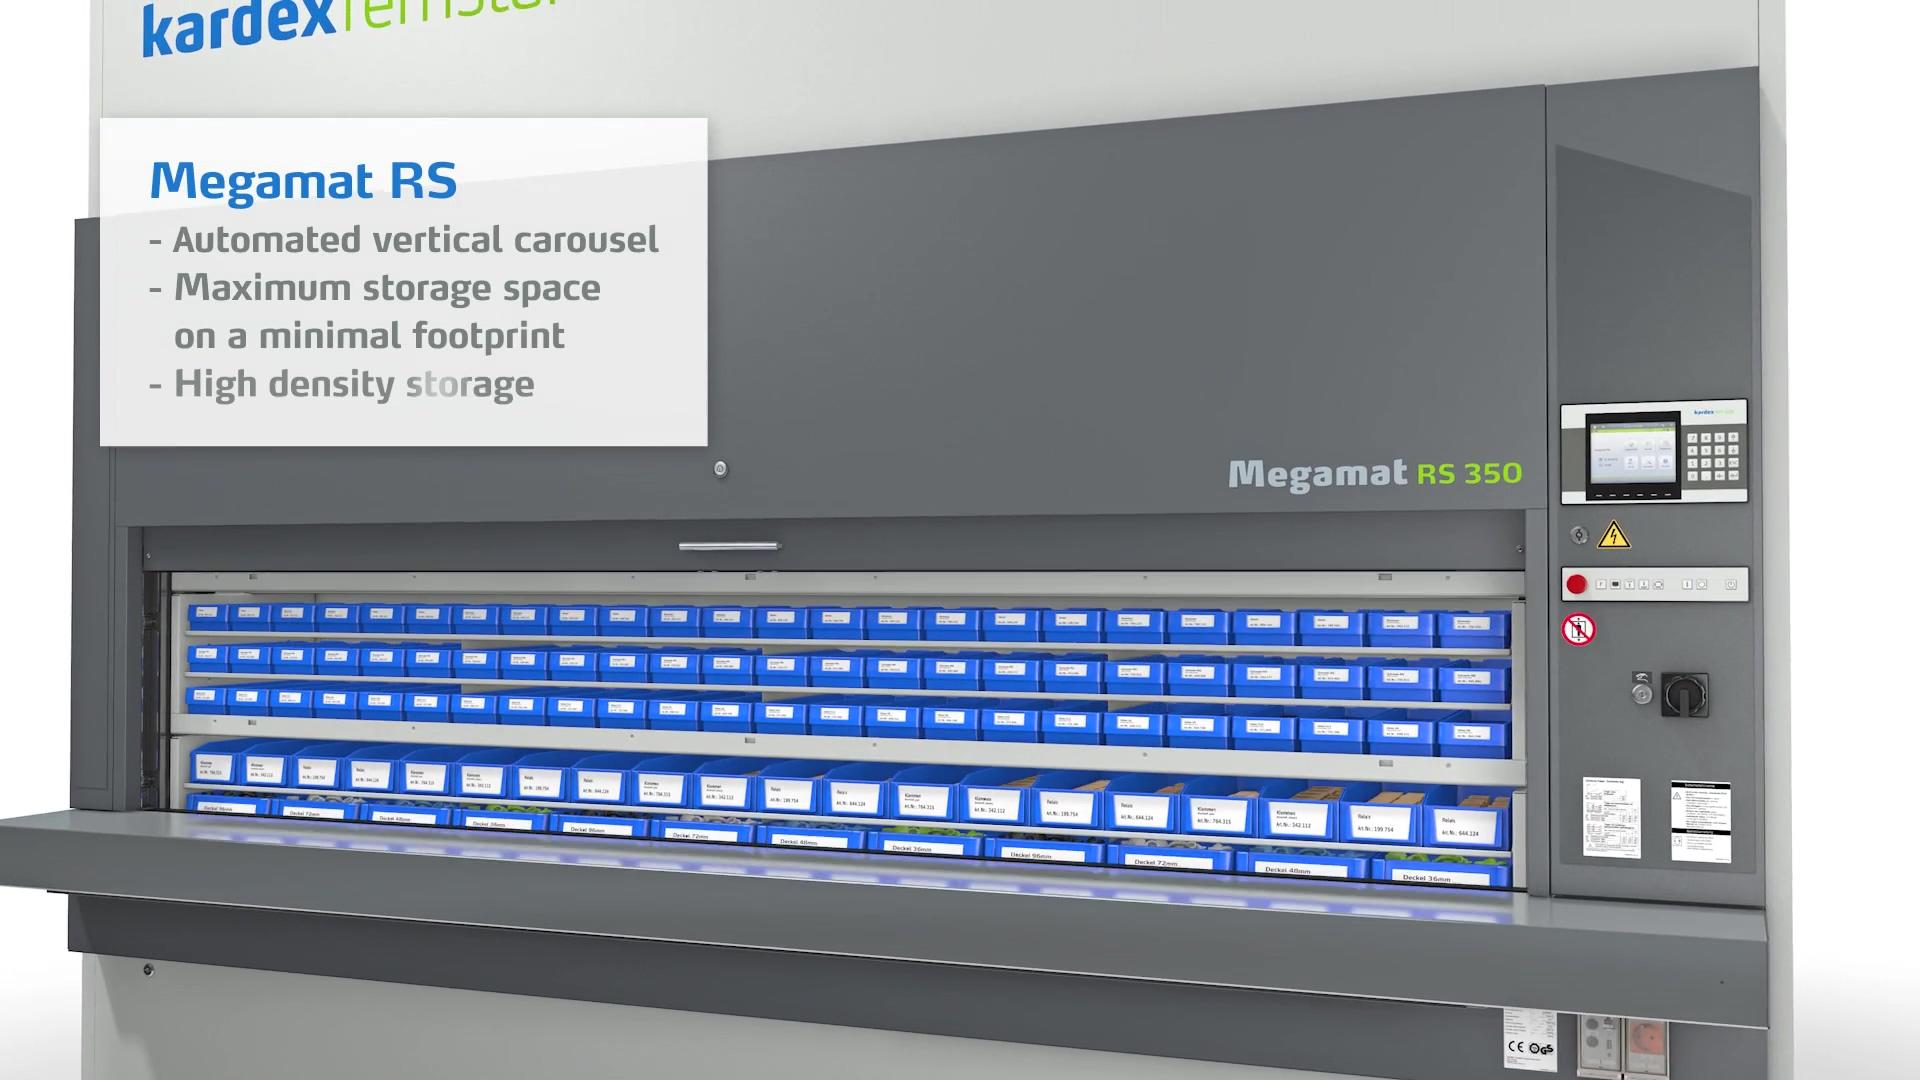 MegamatRS_Product_Video